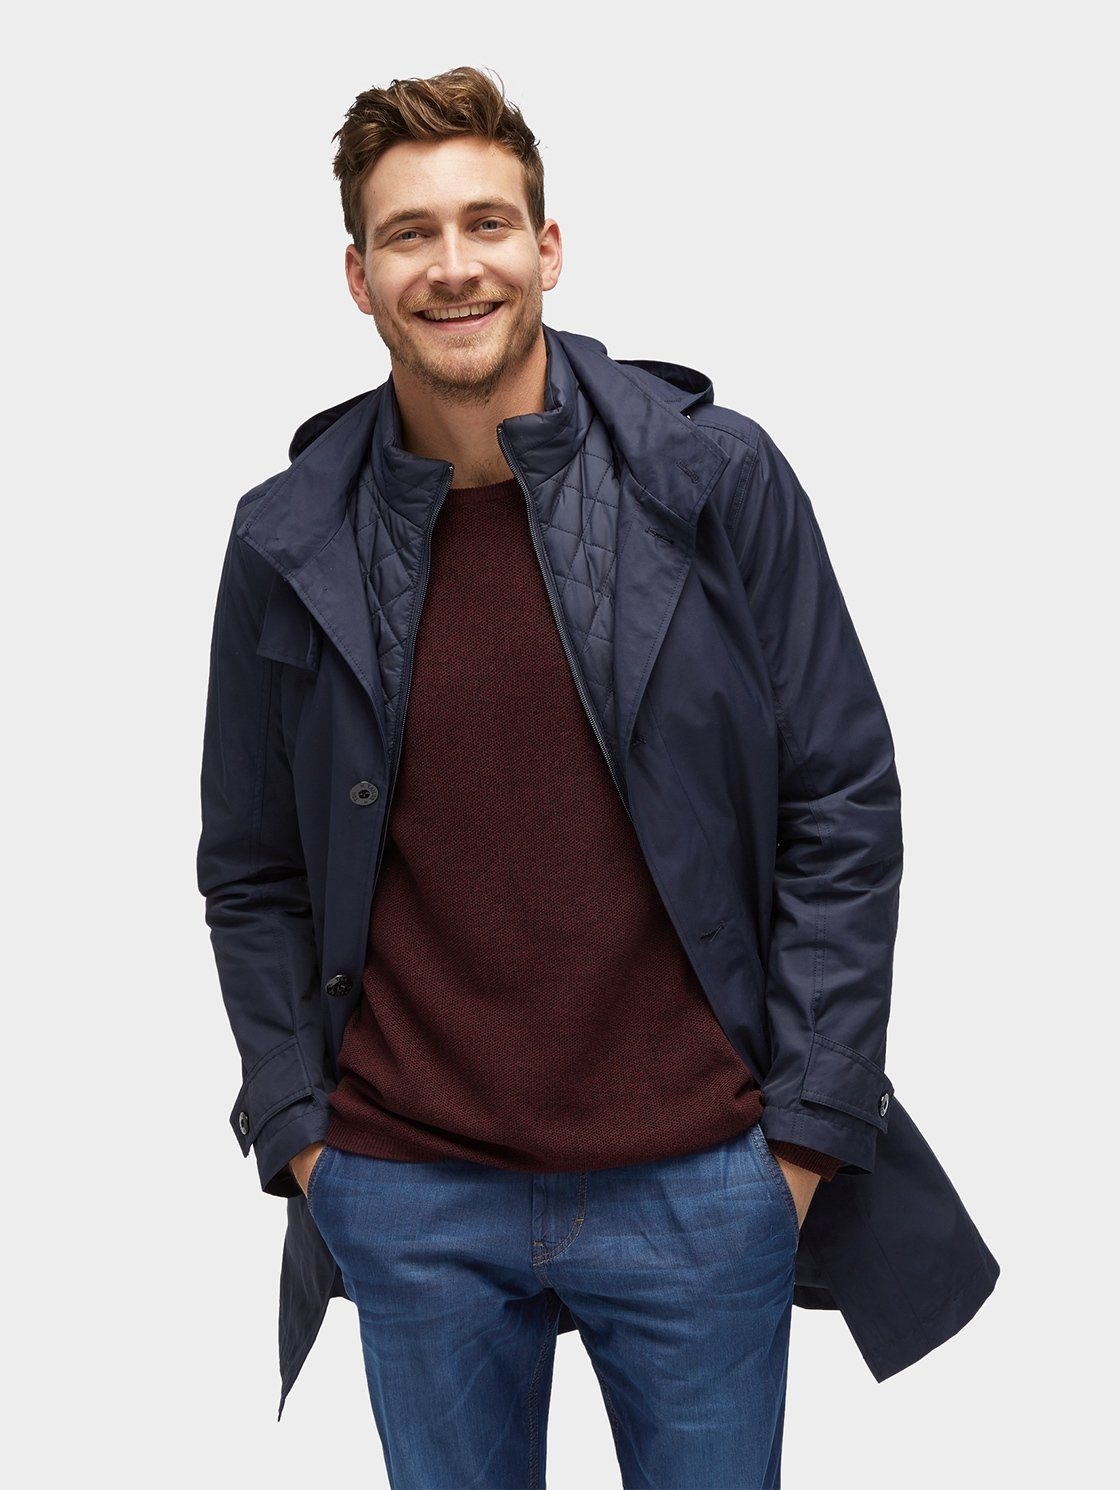 Tom Tailor Kurzmantel »2-in-1 Jacke mit herausnehmbarer Innenjacke«